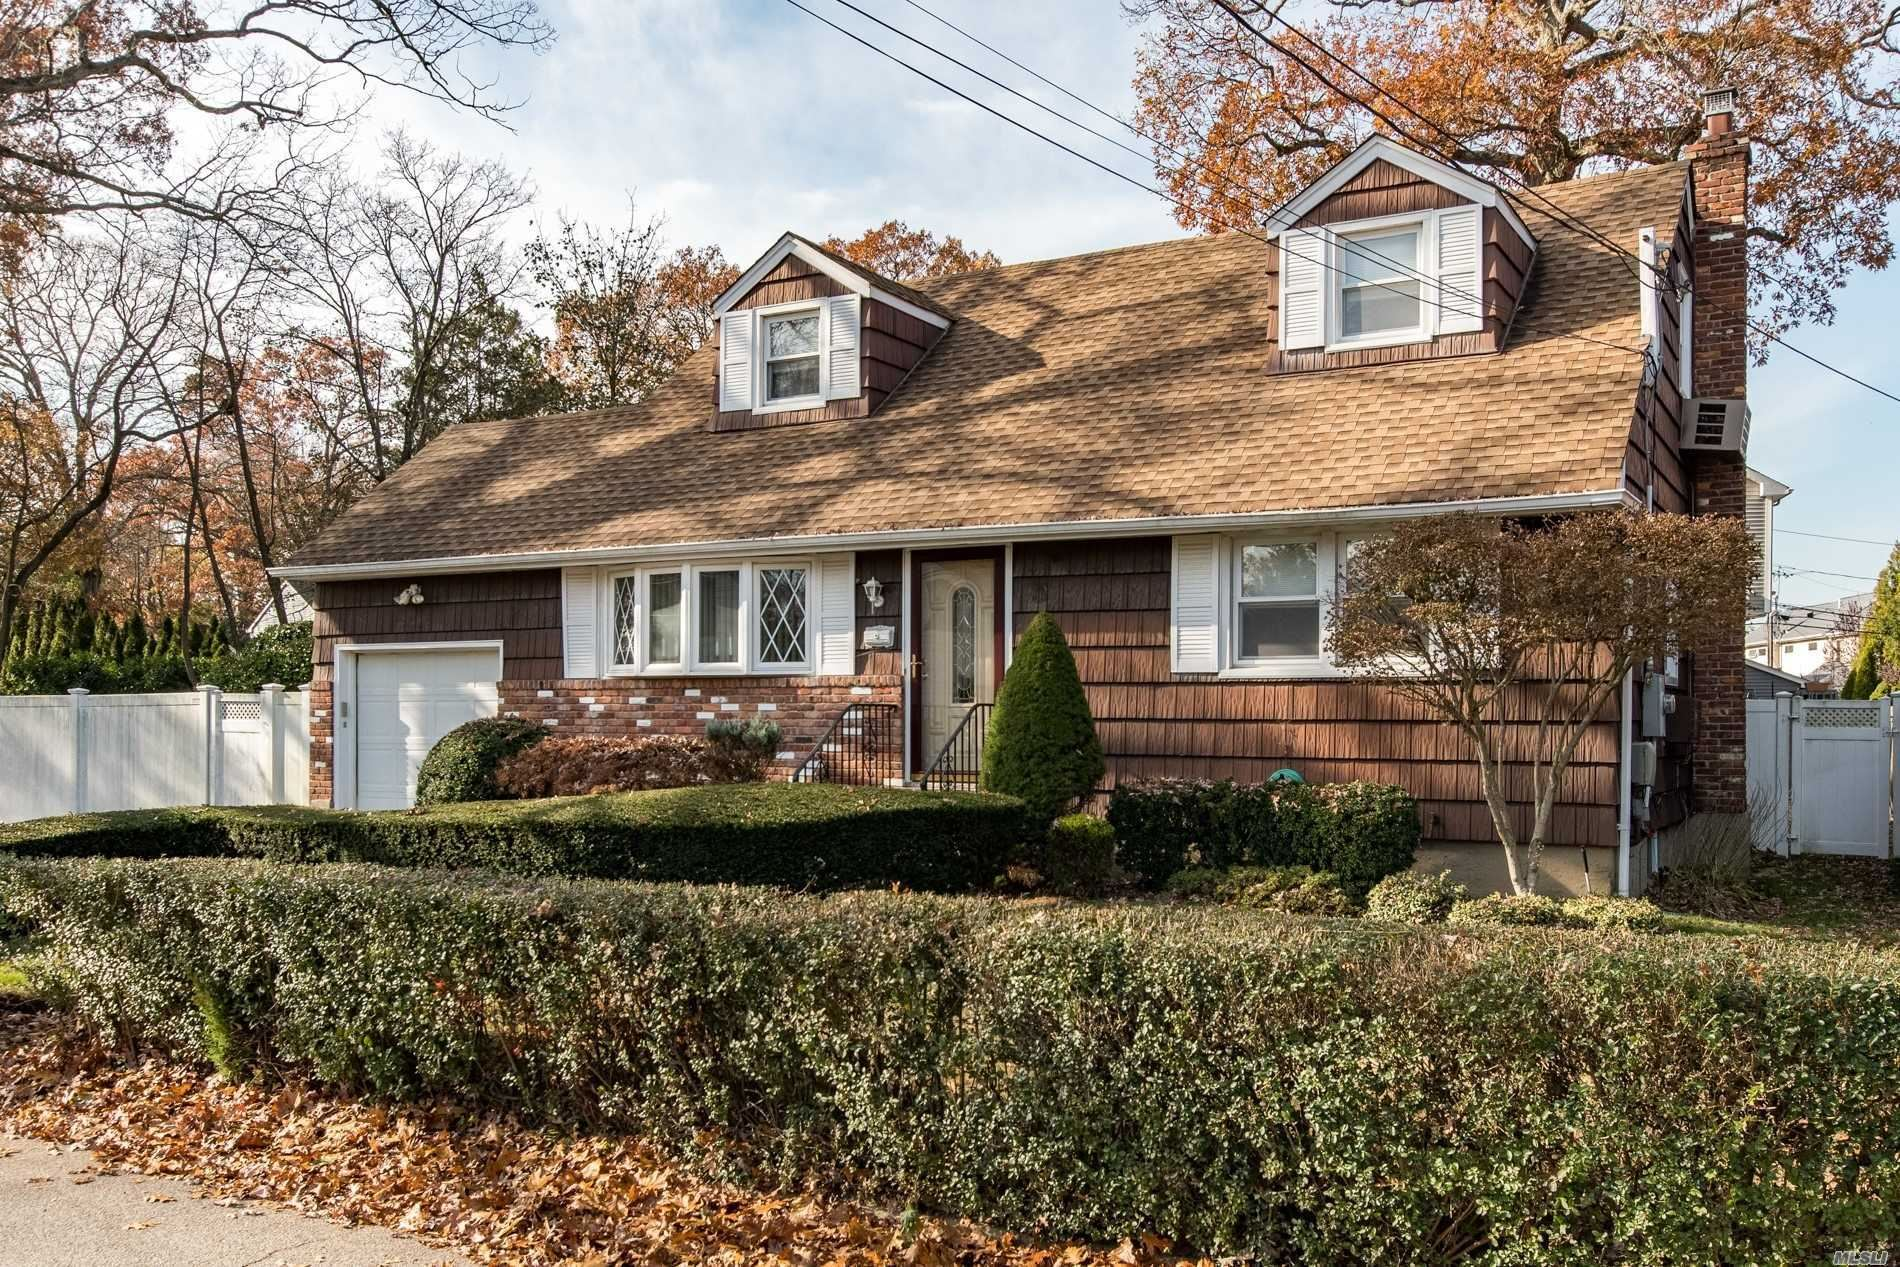 1614 East Drive, Merrick, NY 11566 - MLS#: 3221035